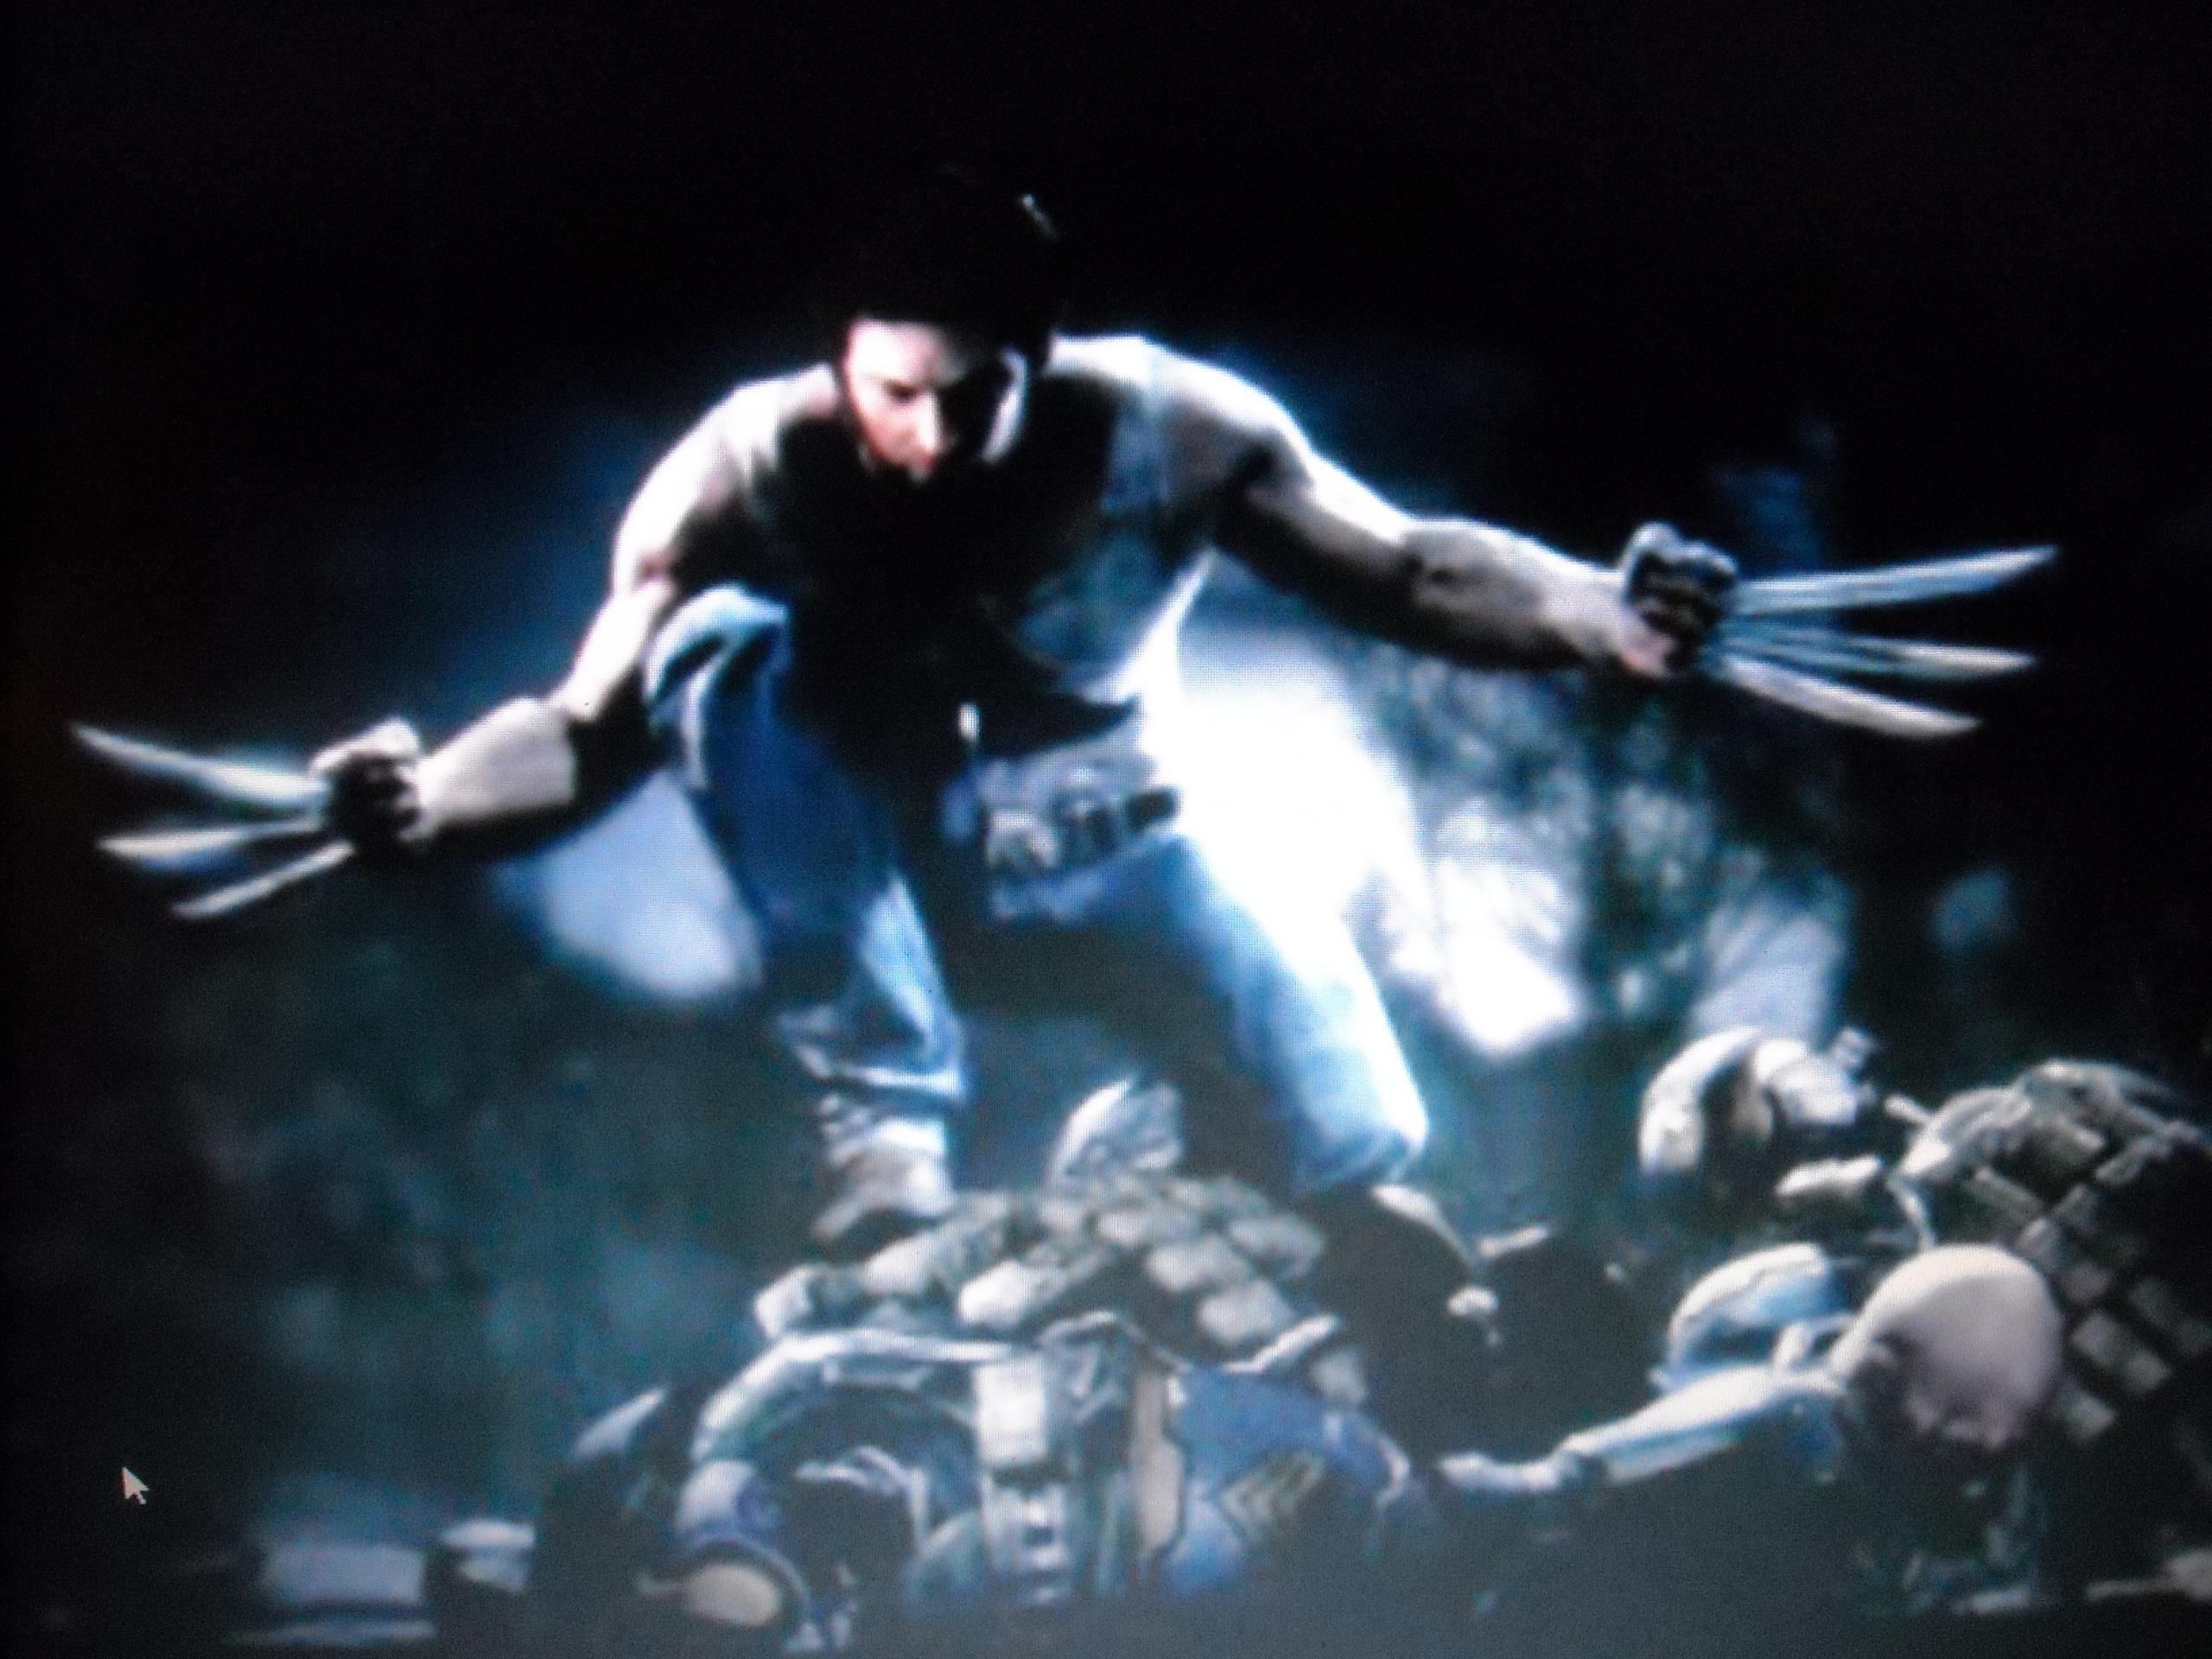 Games Wallpapers HD X Men Origins Wolverine Game Wallpaper 2560x1920